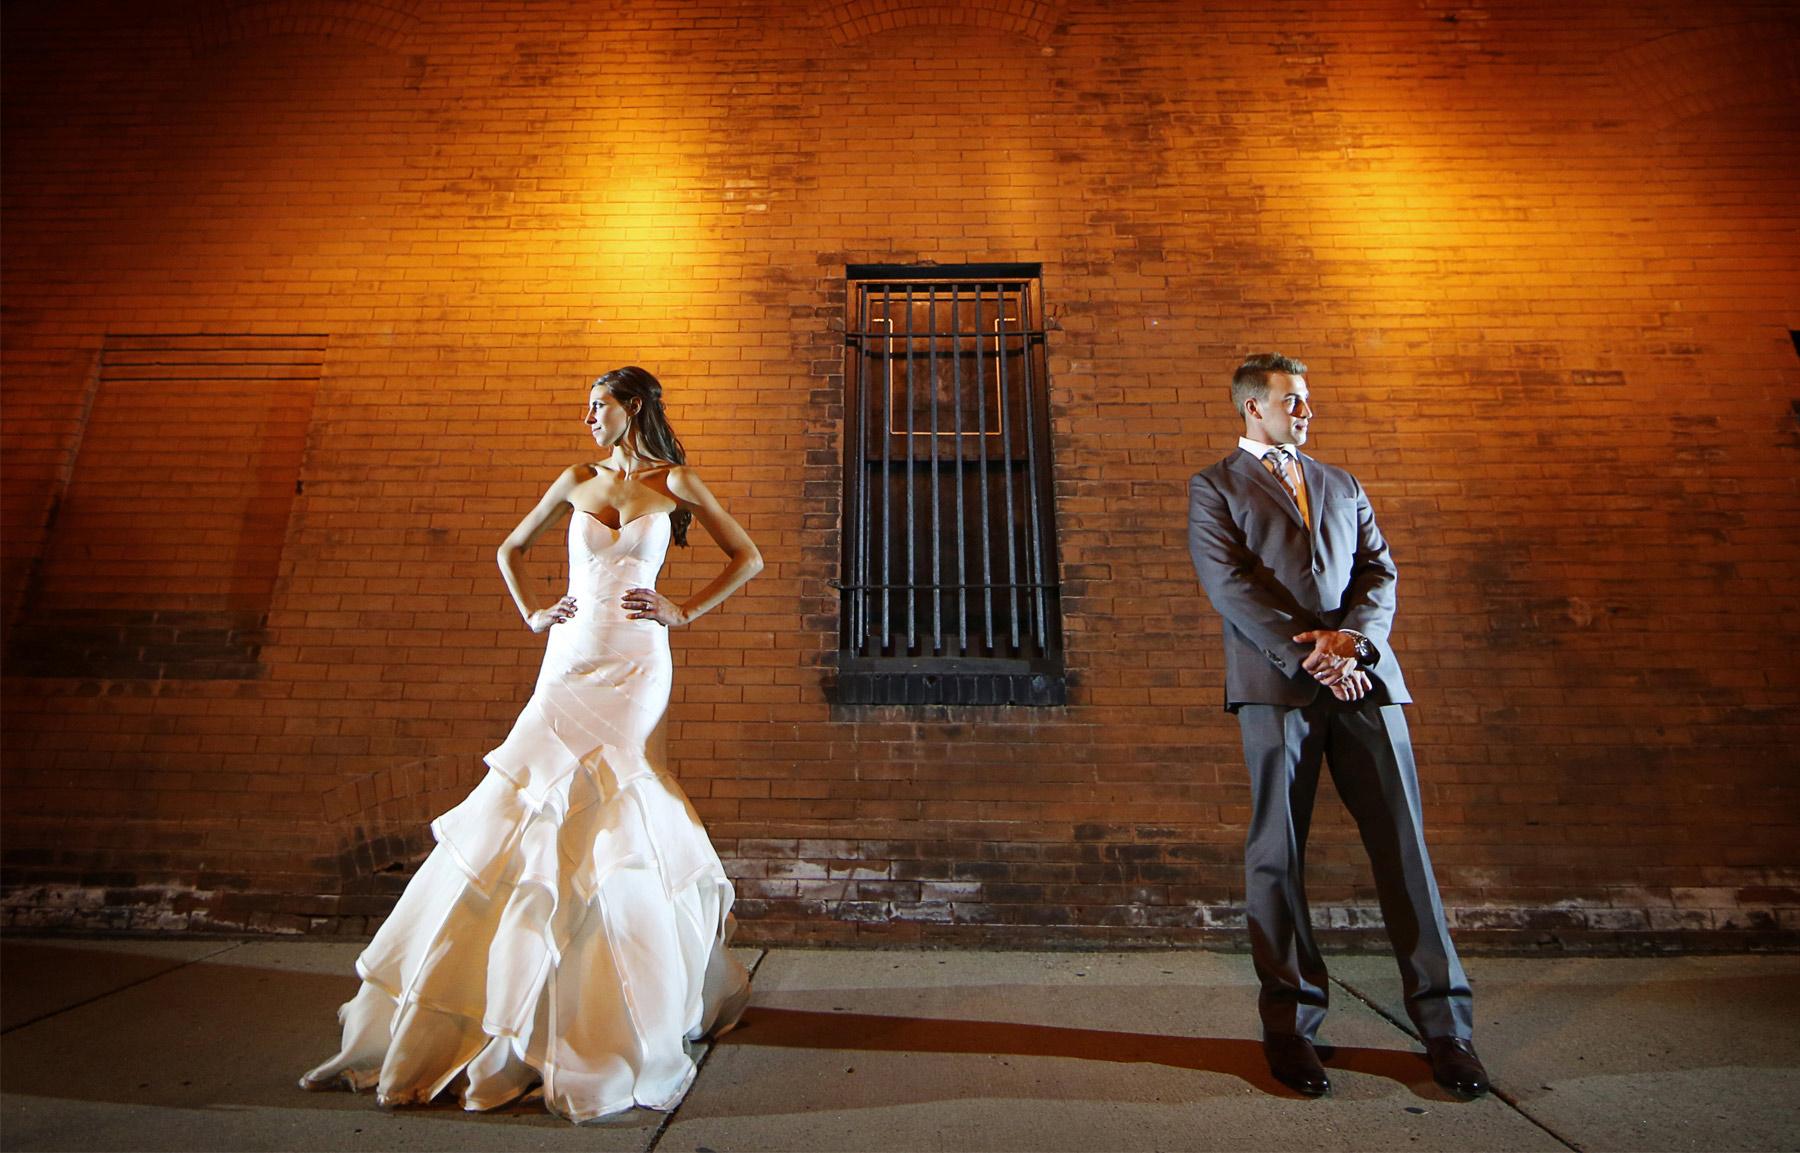 20-Minneapolis-Minnesota-Wedding-Photography-by-Vick-Photography-Aria-Night-Photography-Katie-&-Joe.jpg